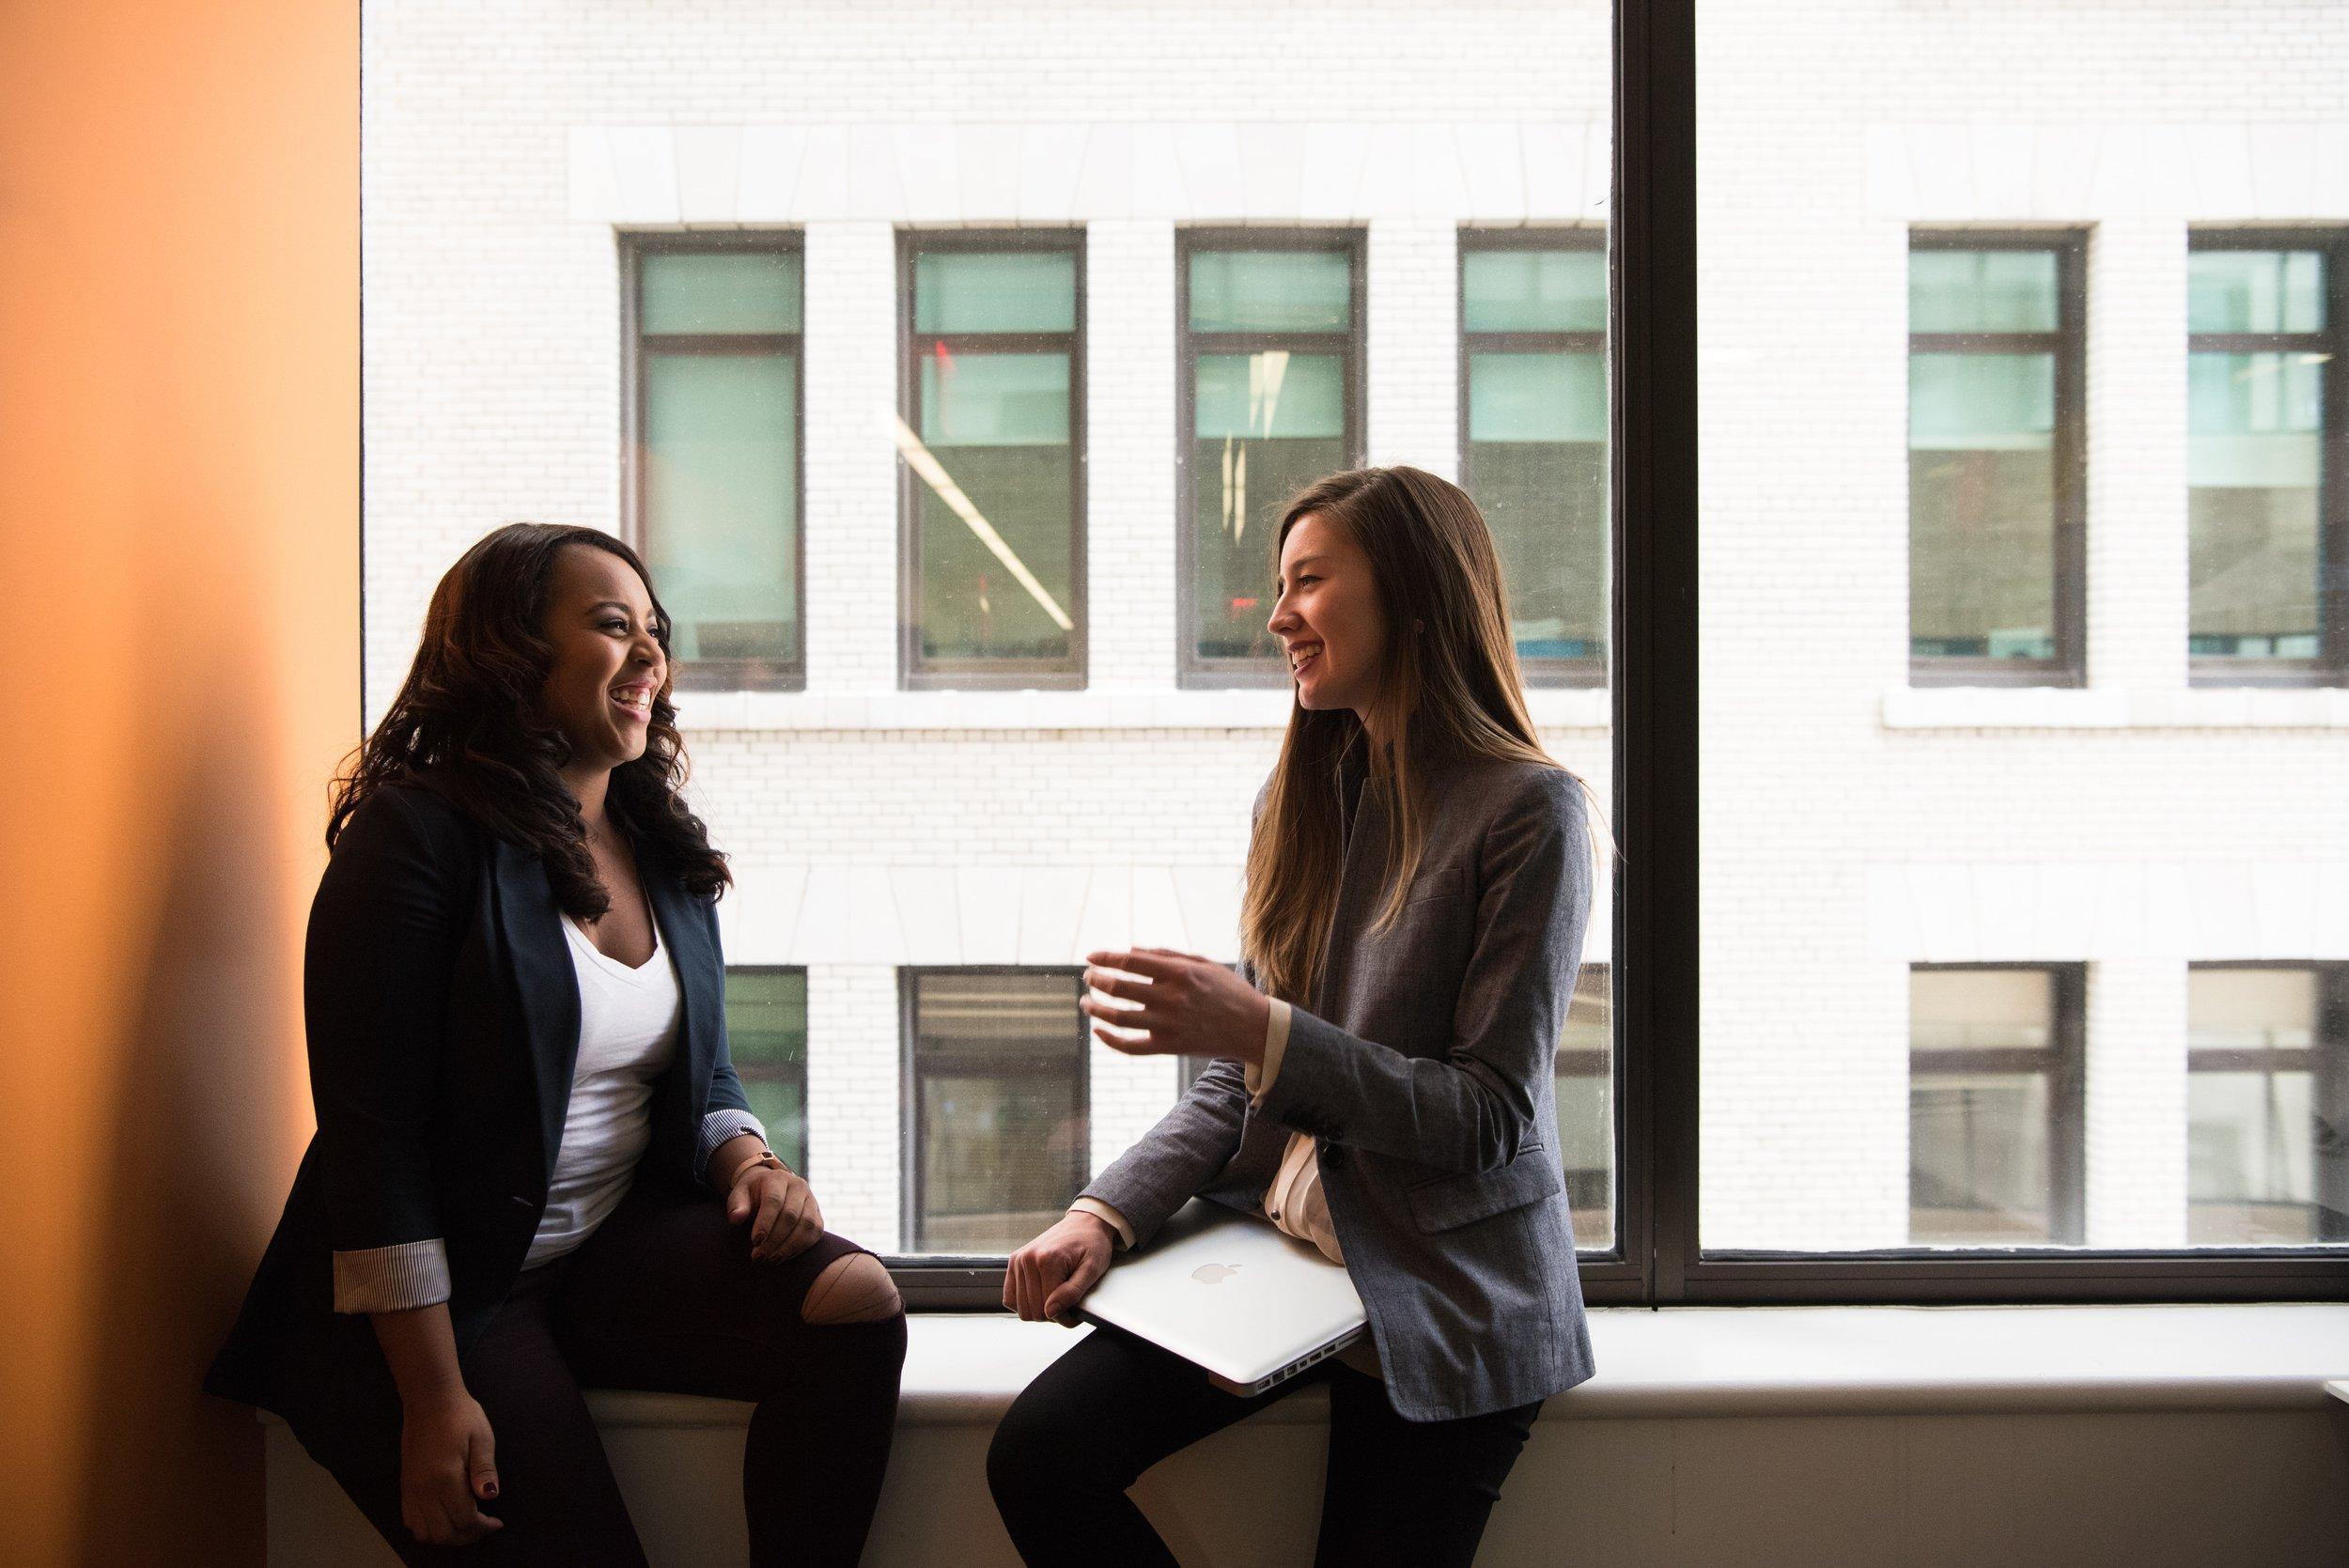 daytime-discussing-employees-1181562.jpg